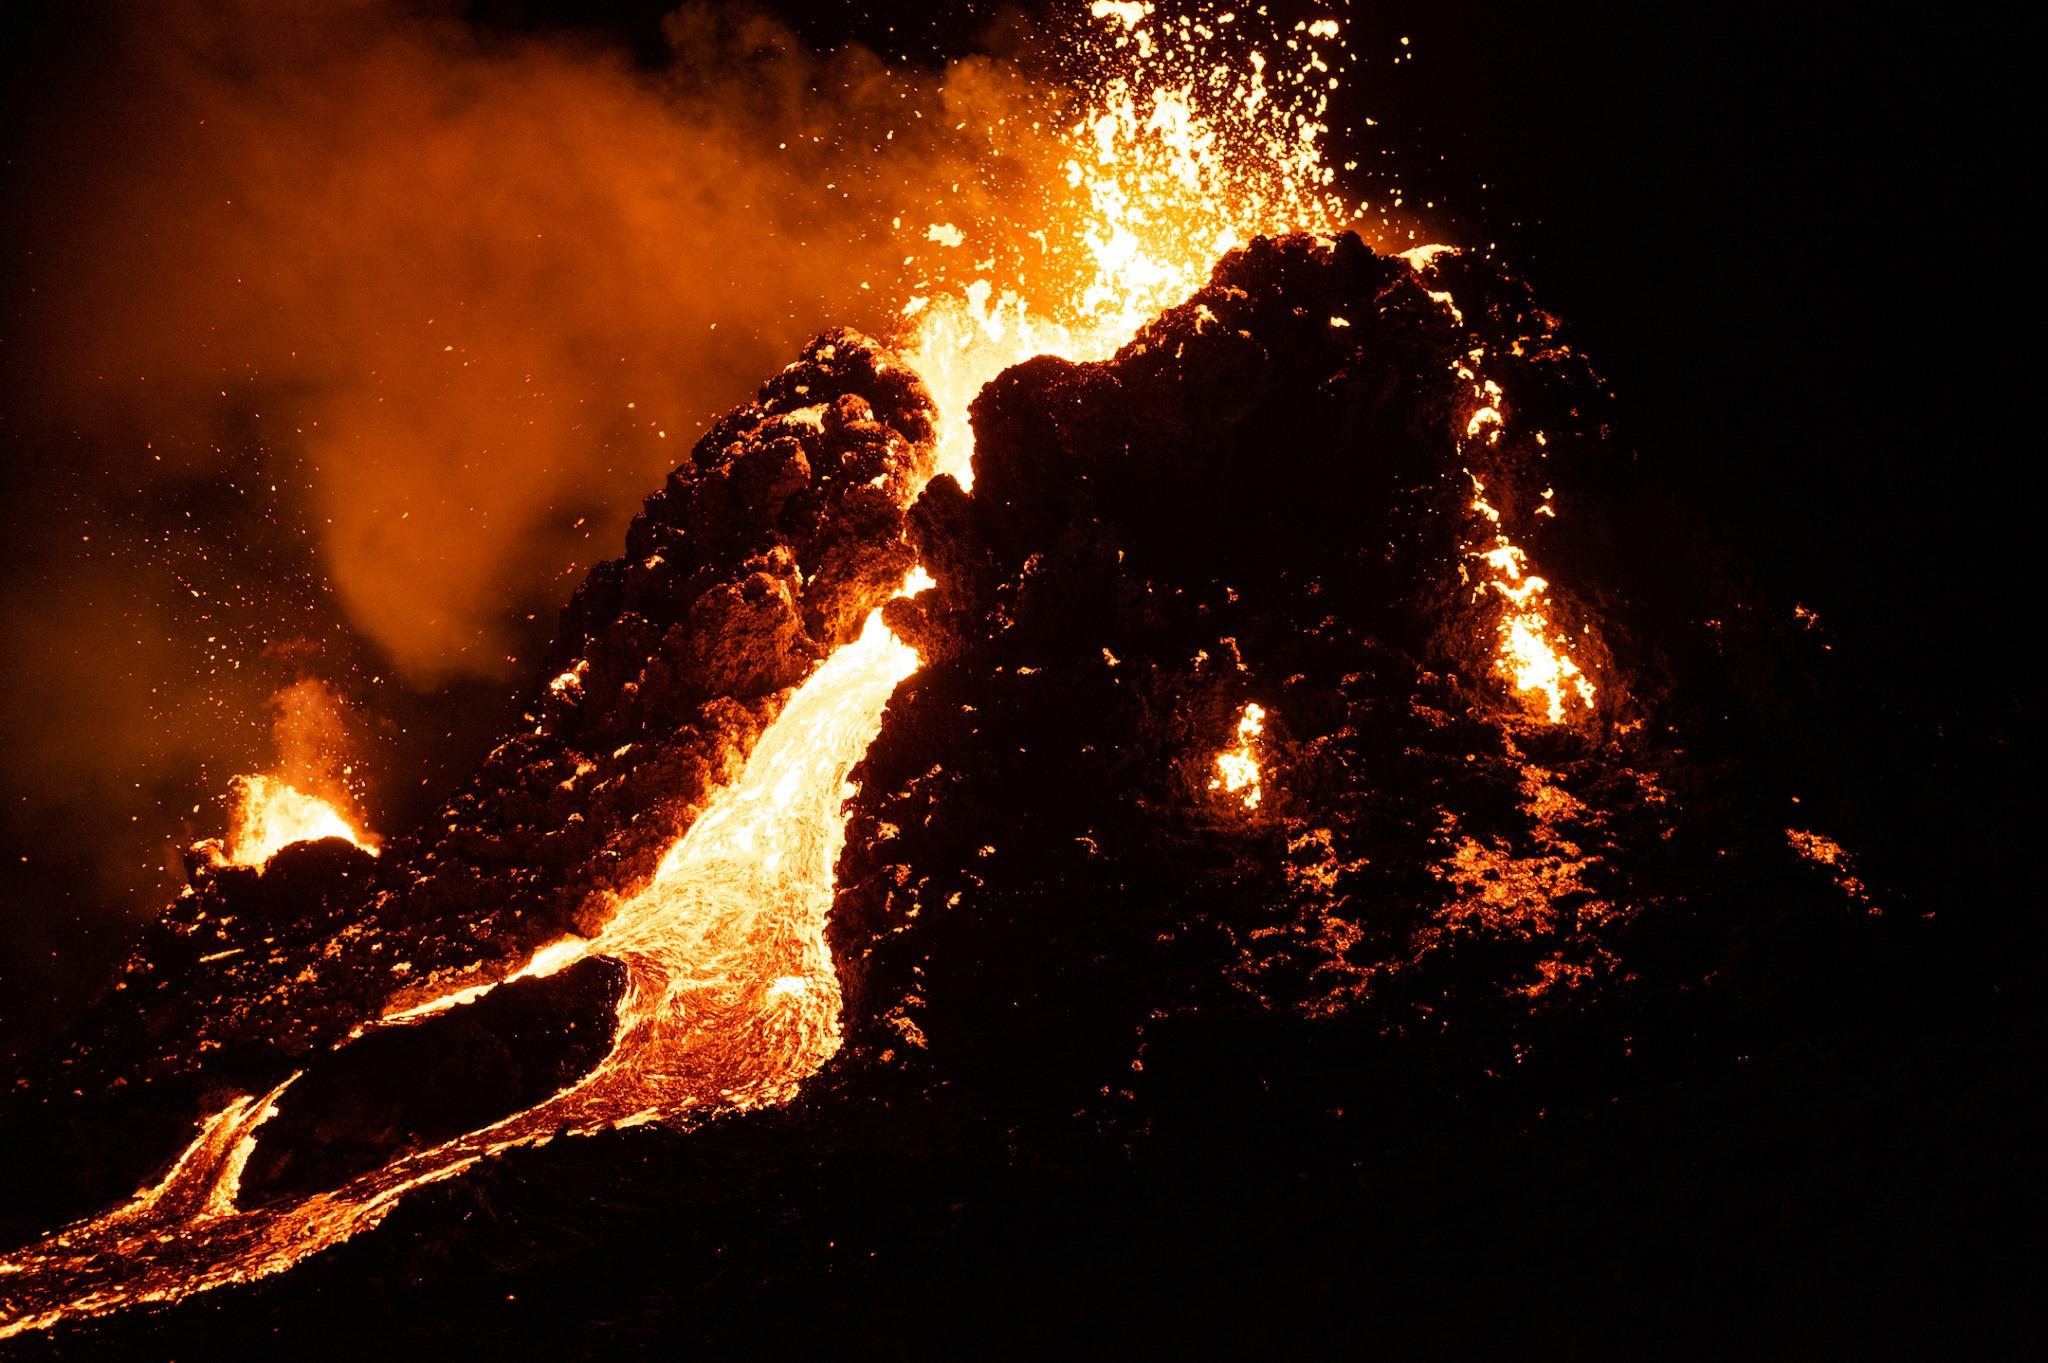 Shield volcano?